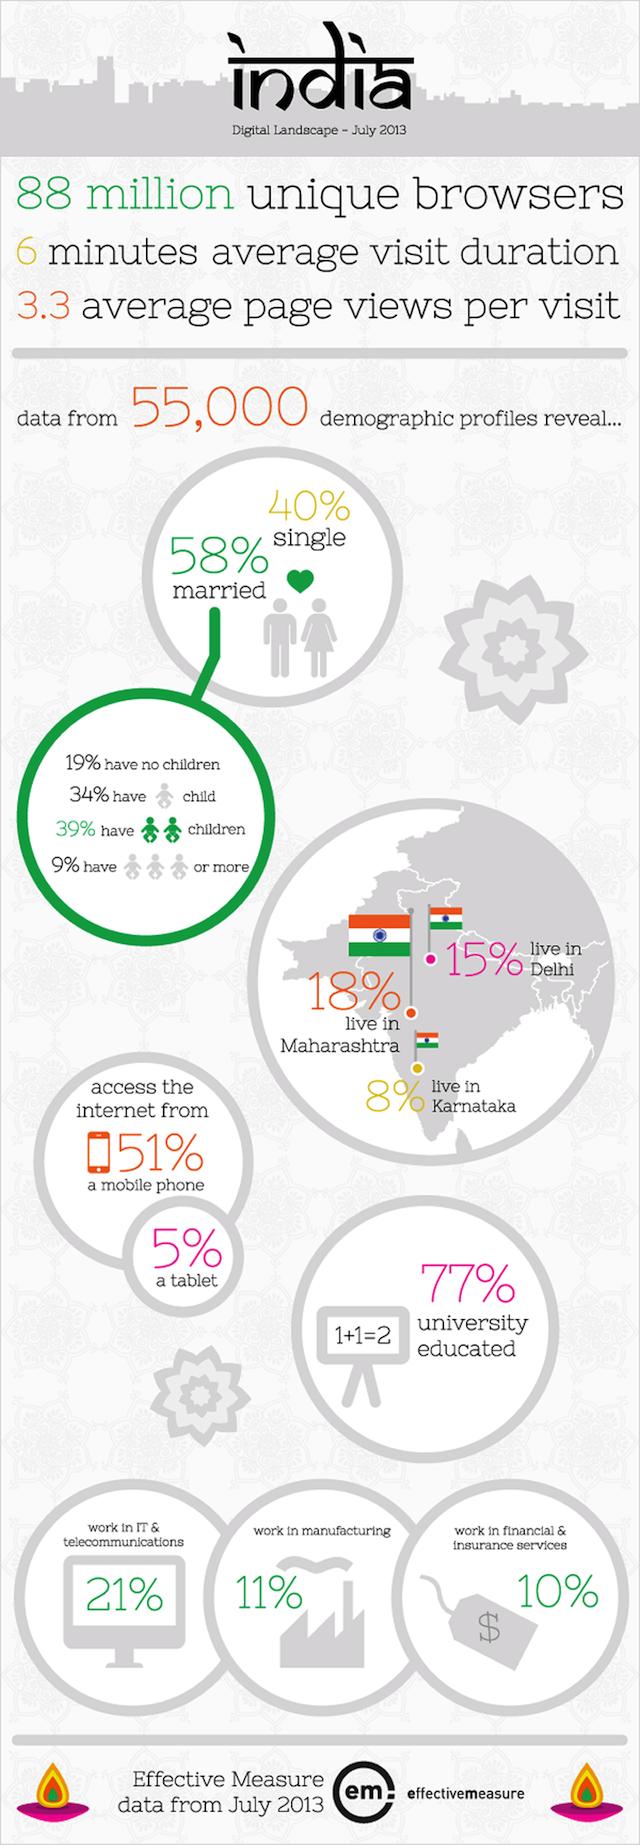 india-infogrpahic-august13